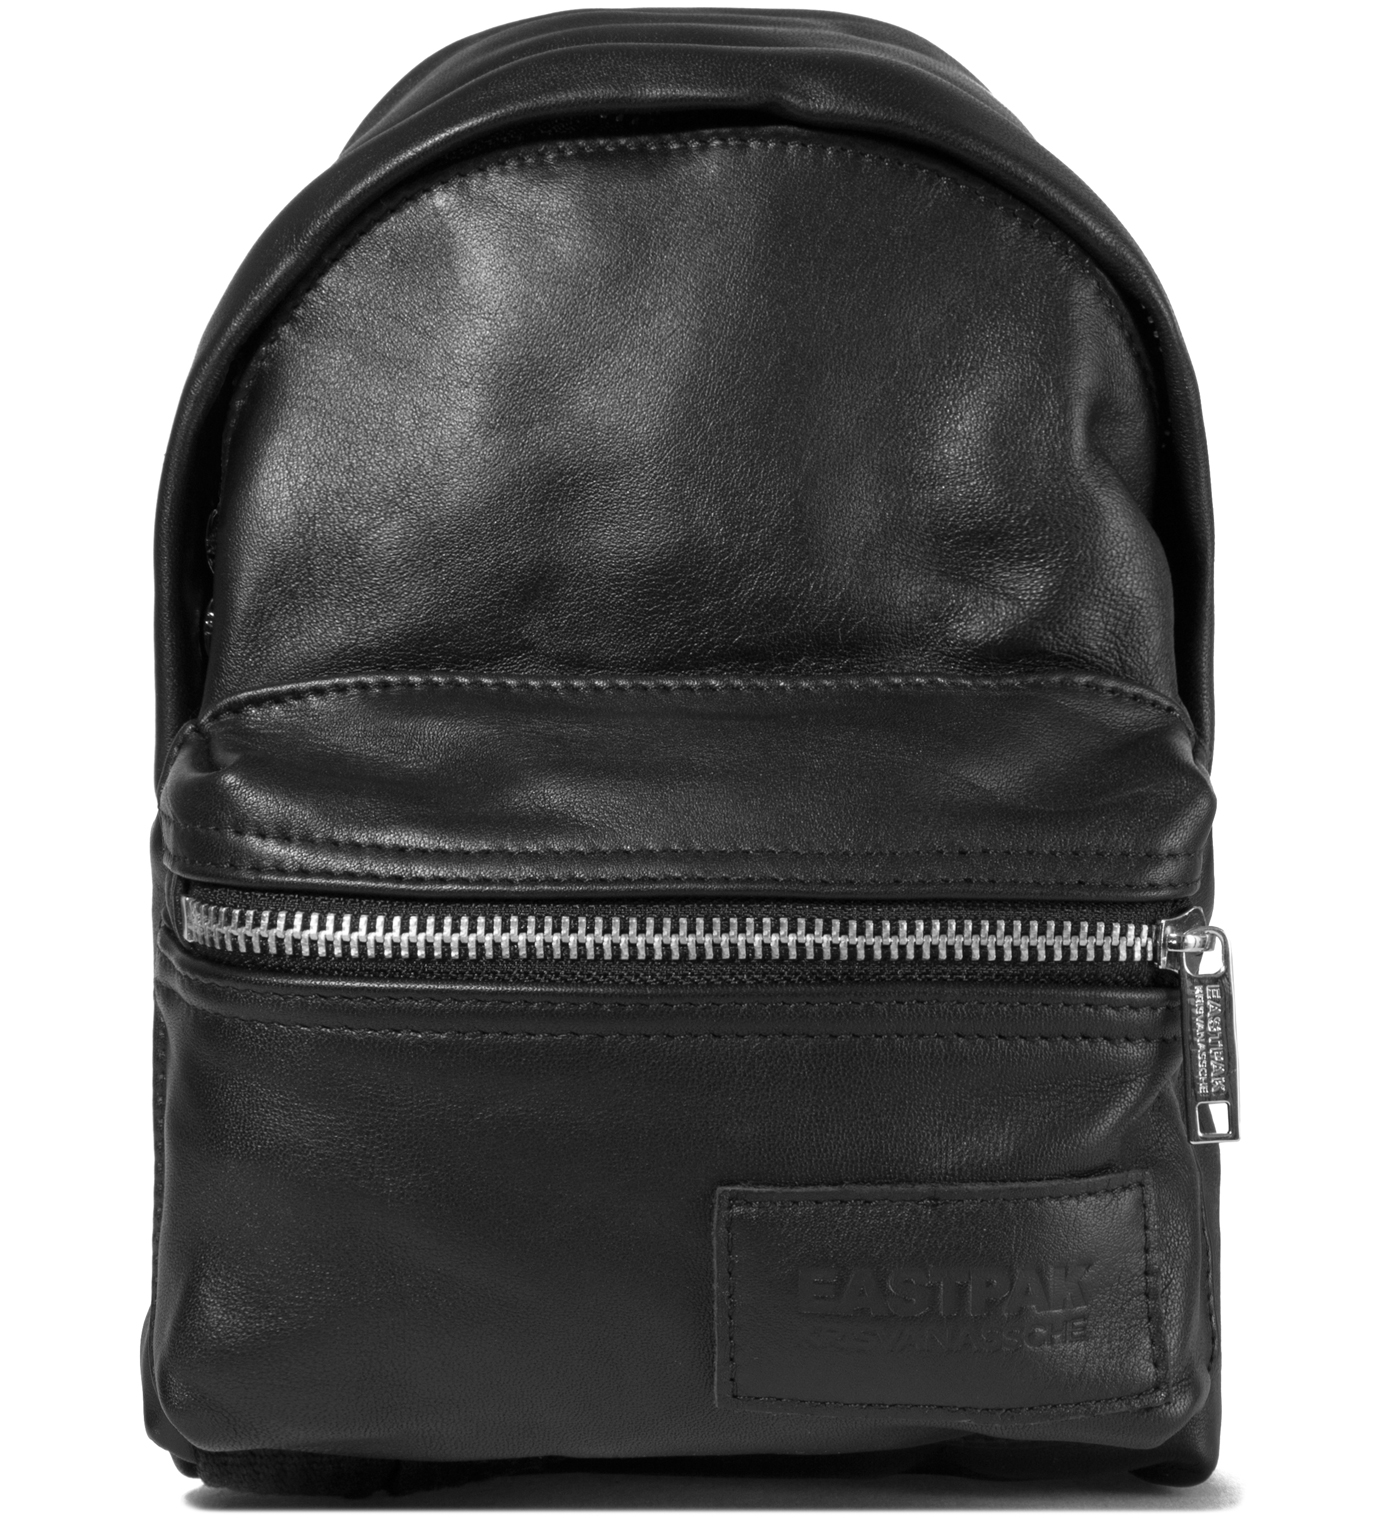 KRISVANASSCHE Eastpak KRISVANASSCHE Black Leather Mini Backpack Pouch